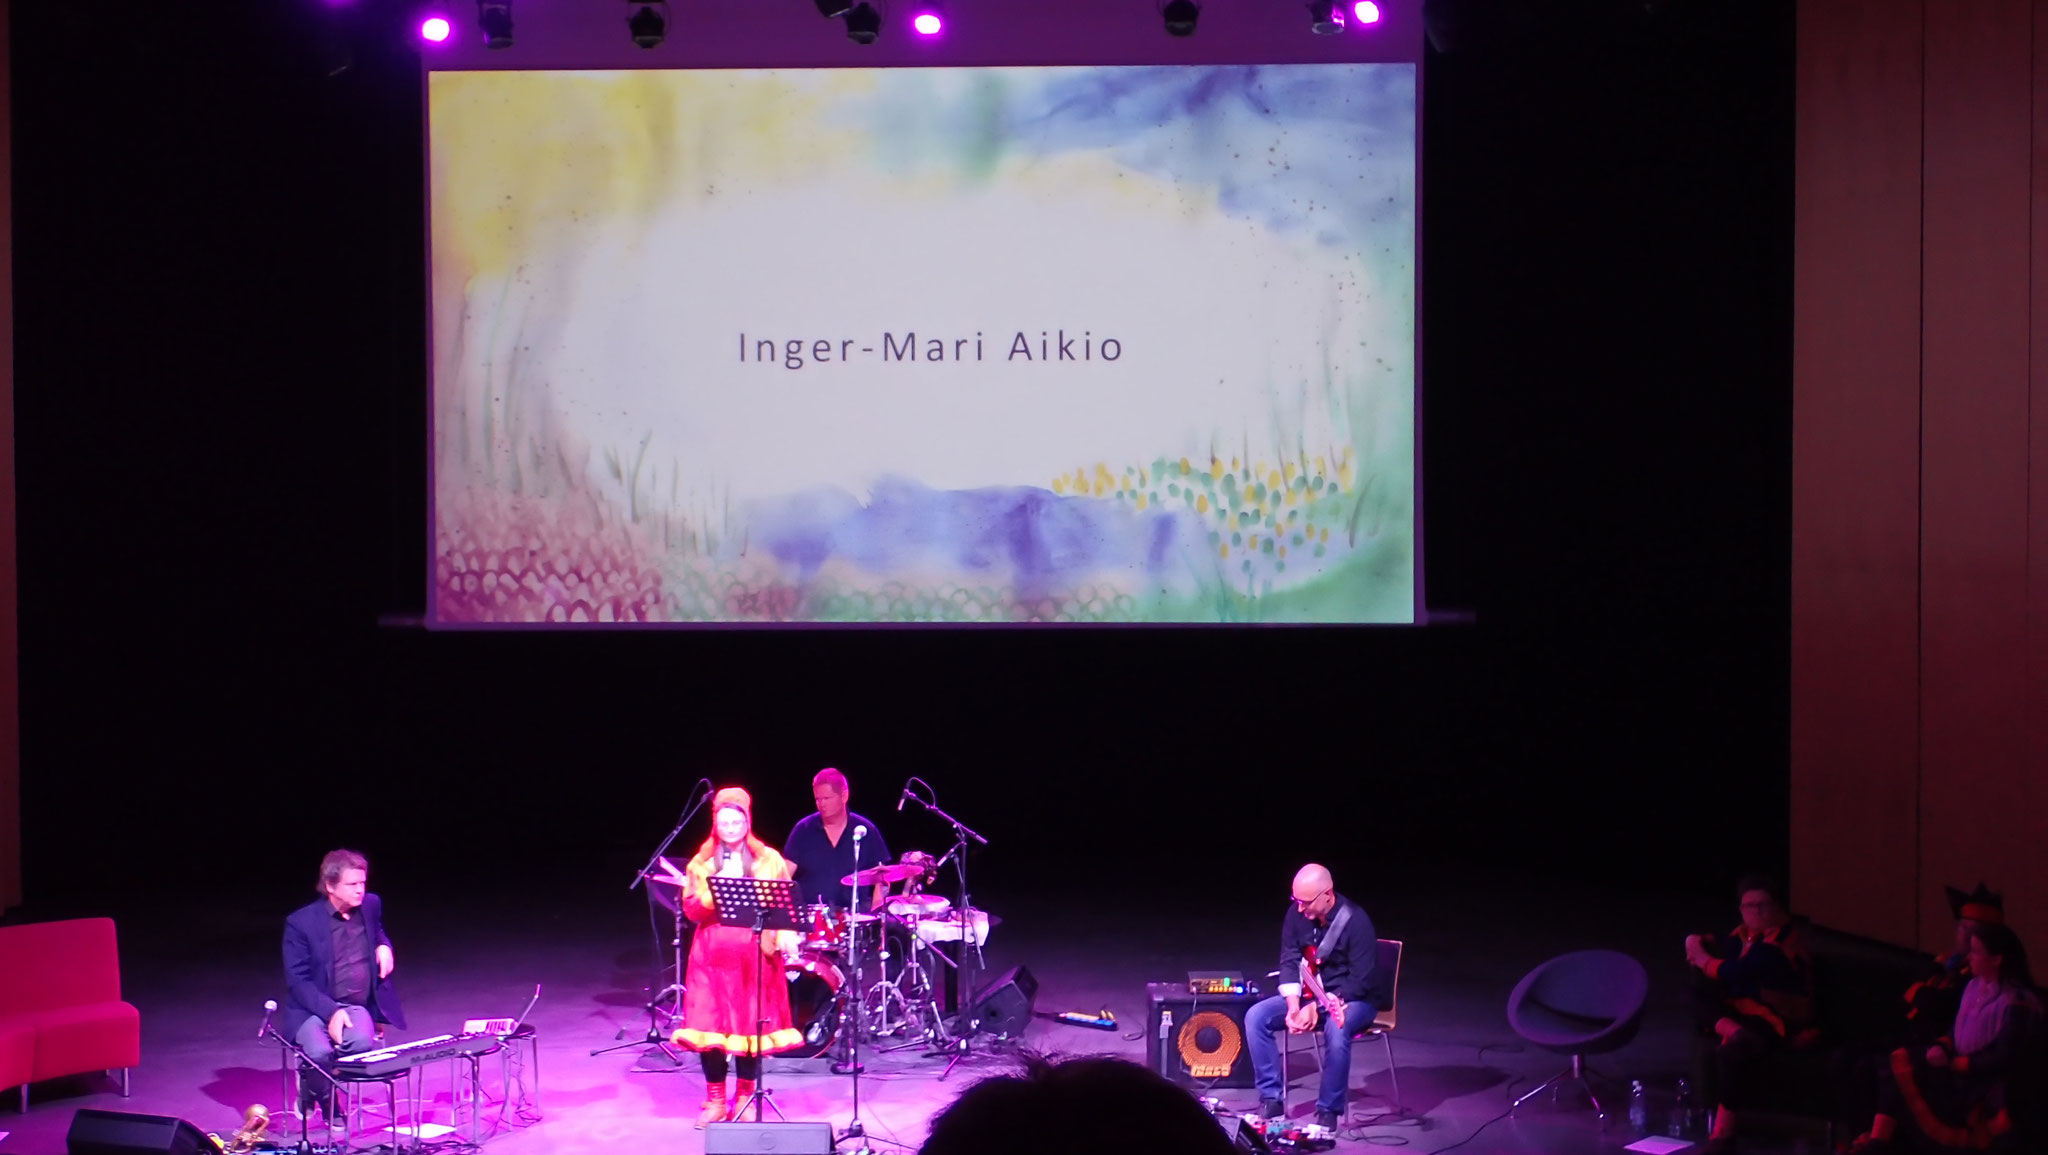 Poetry Inger-Mari Aikio